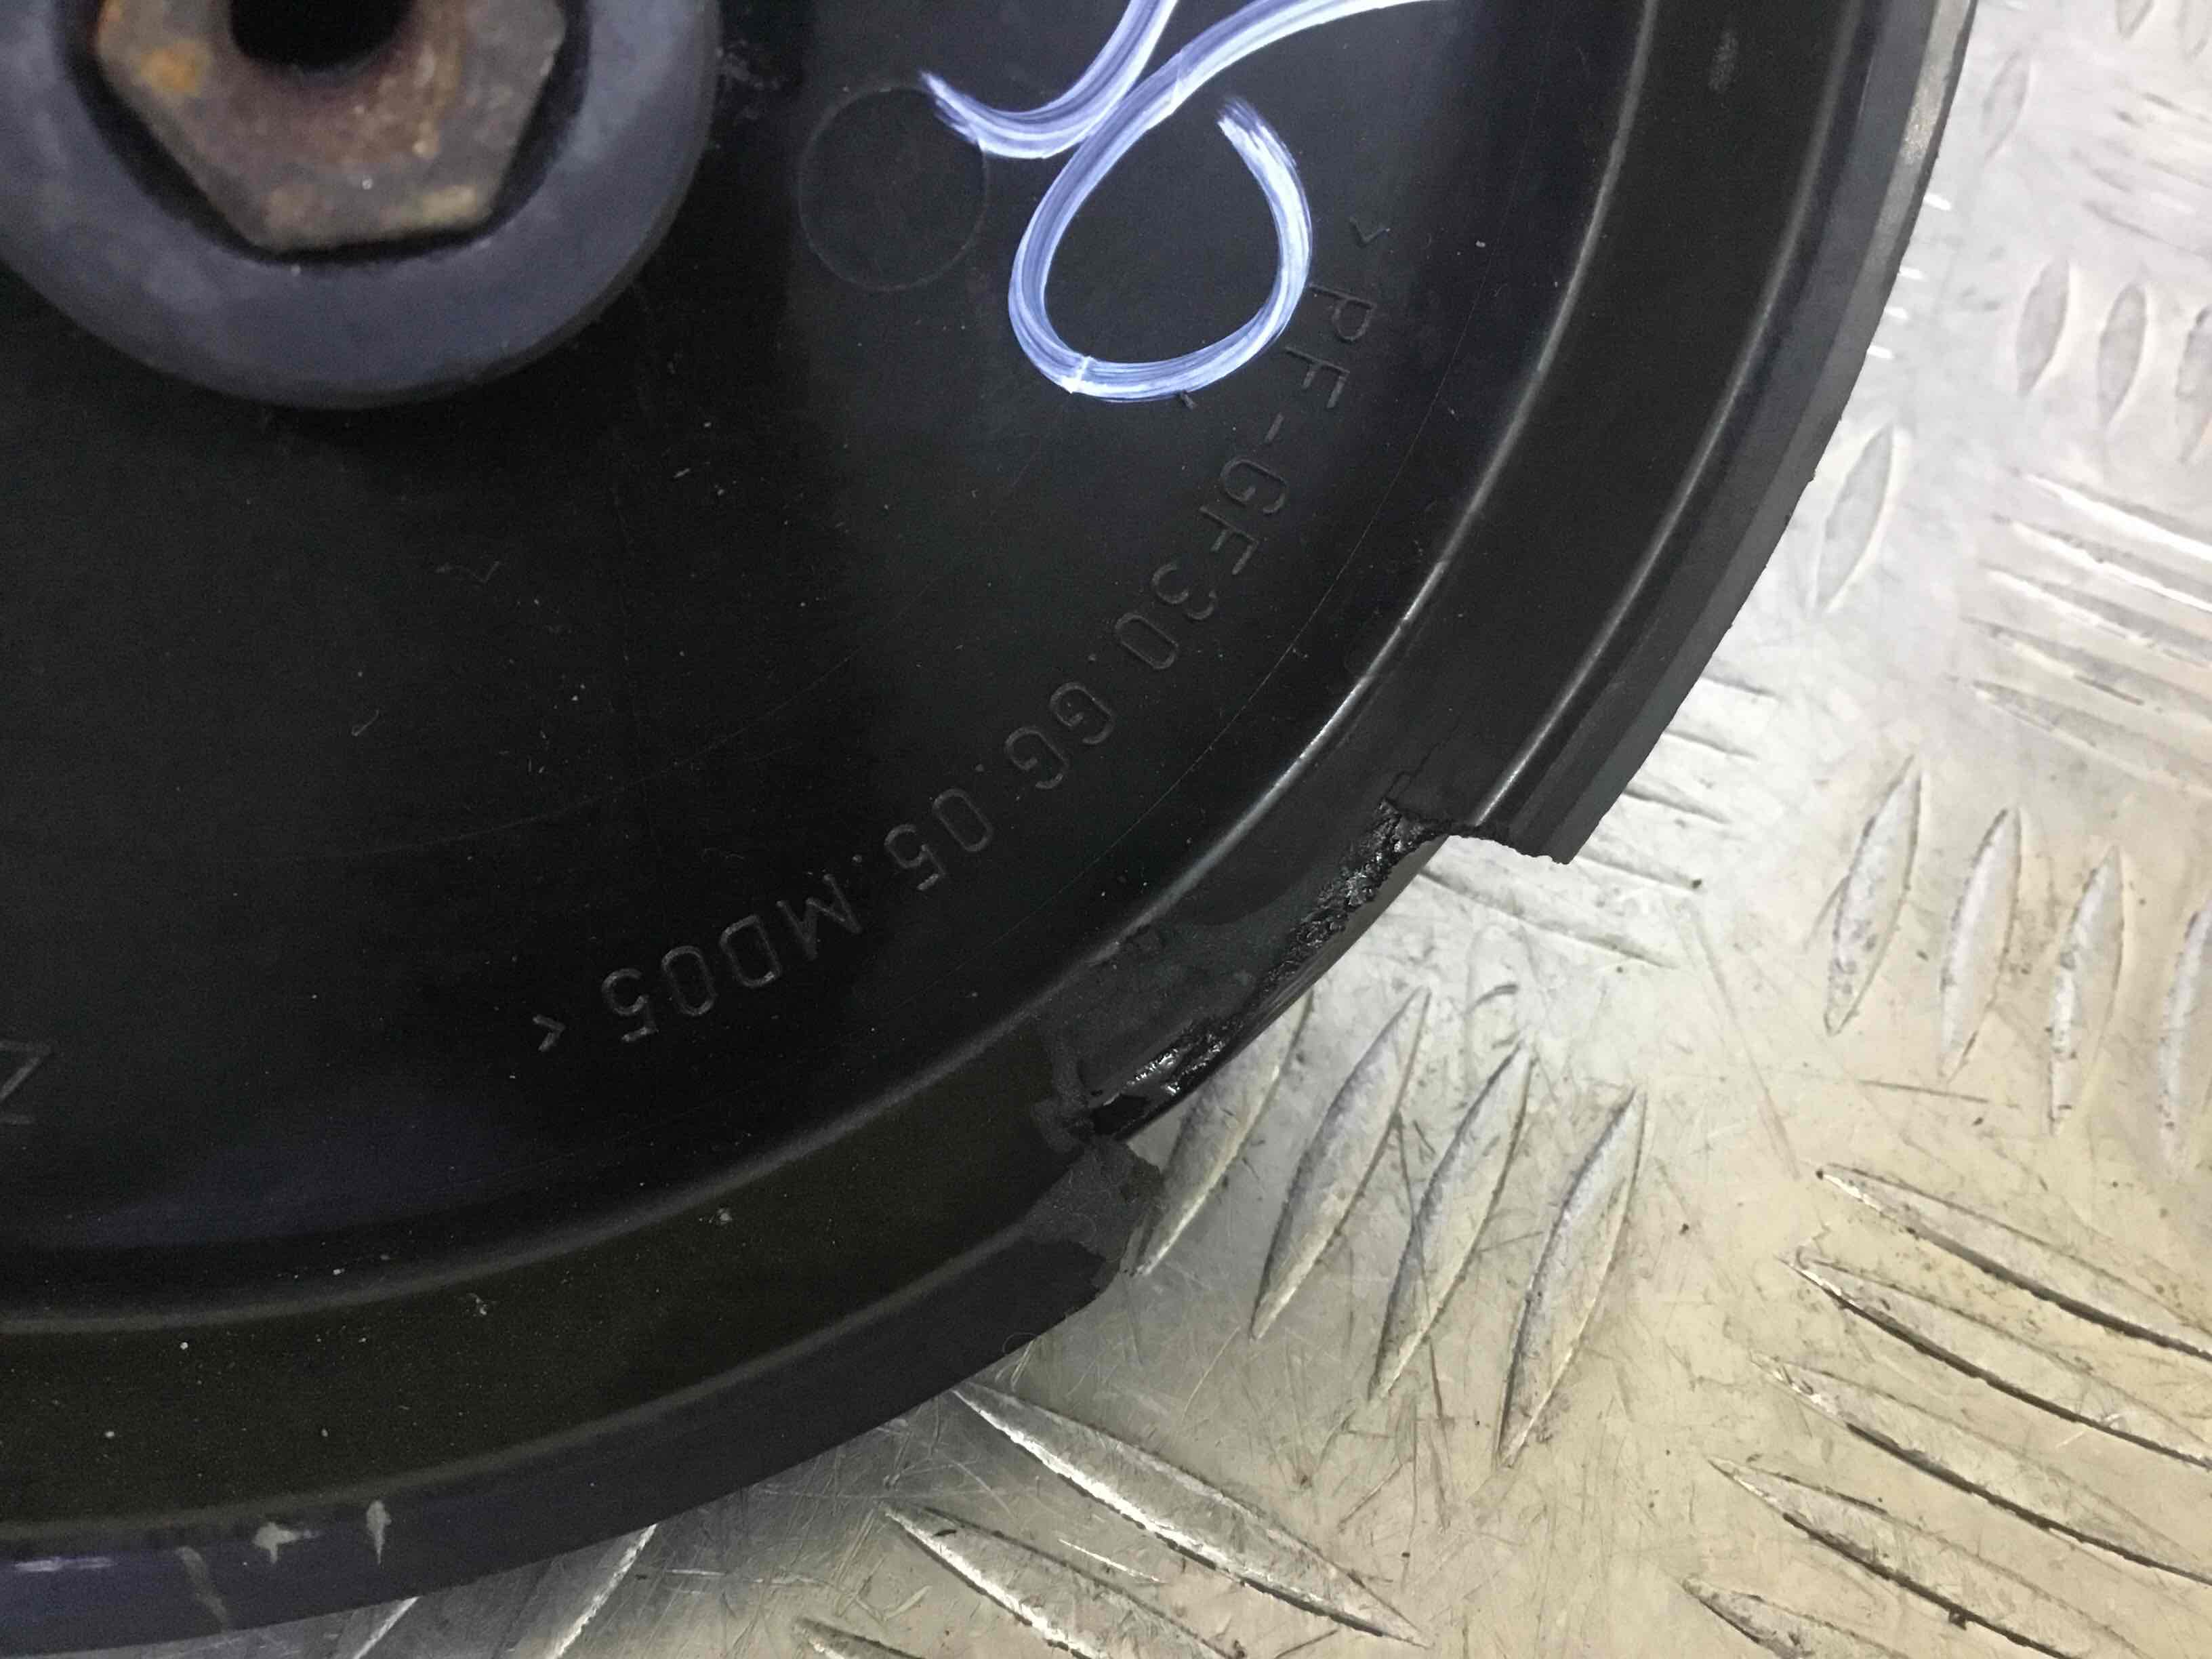 Фото 'Mercedes C-klasse Насос гидроусилителя руля 541019110;  A0034661601;  A0034664001;  A003466400180;  A0034664101;  A003466410180 '